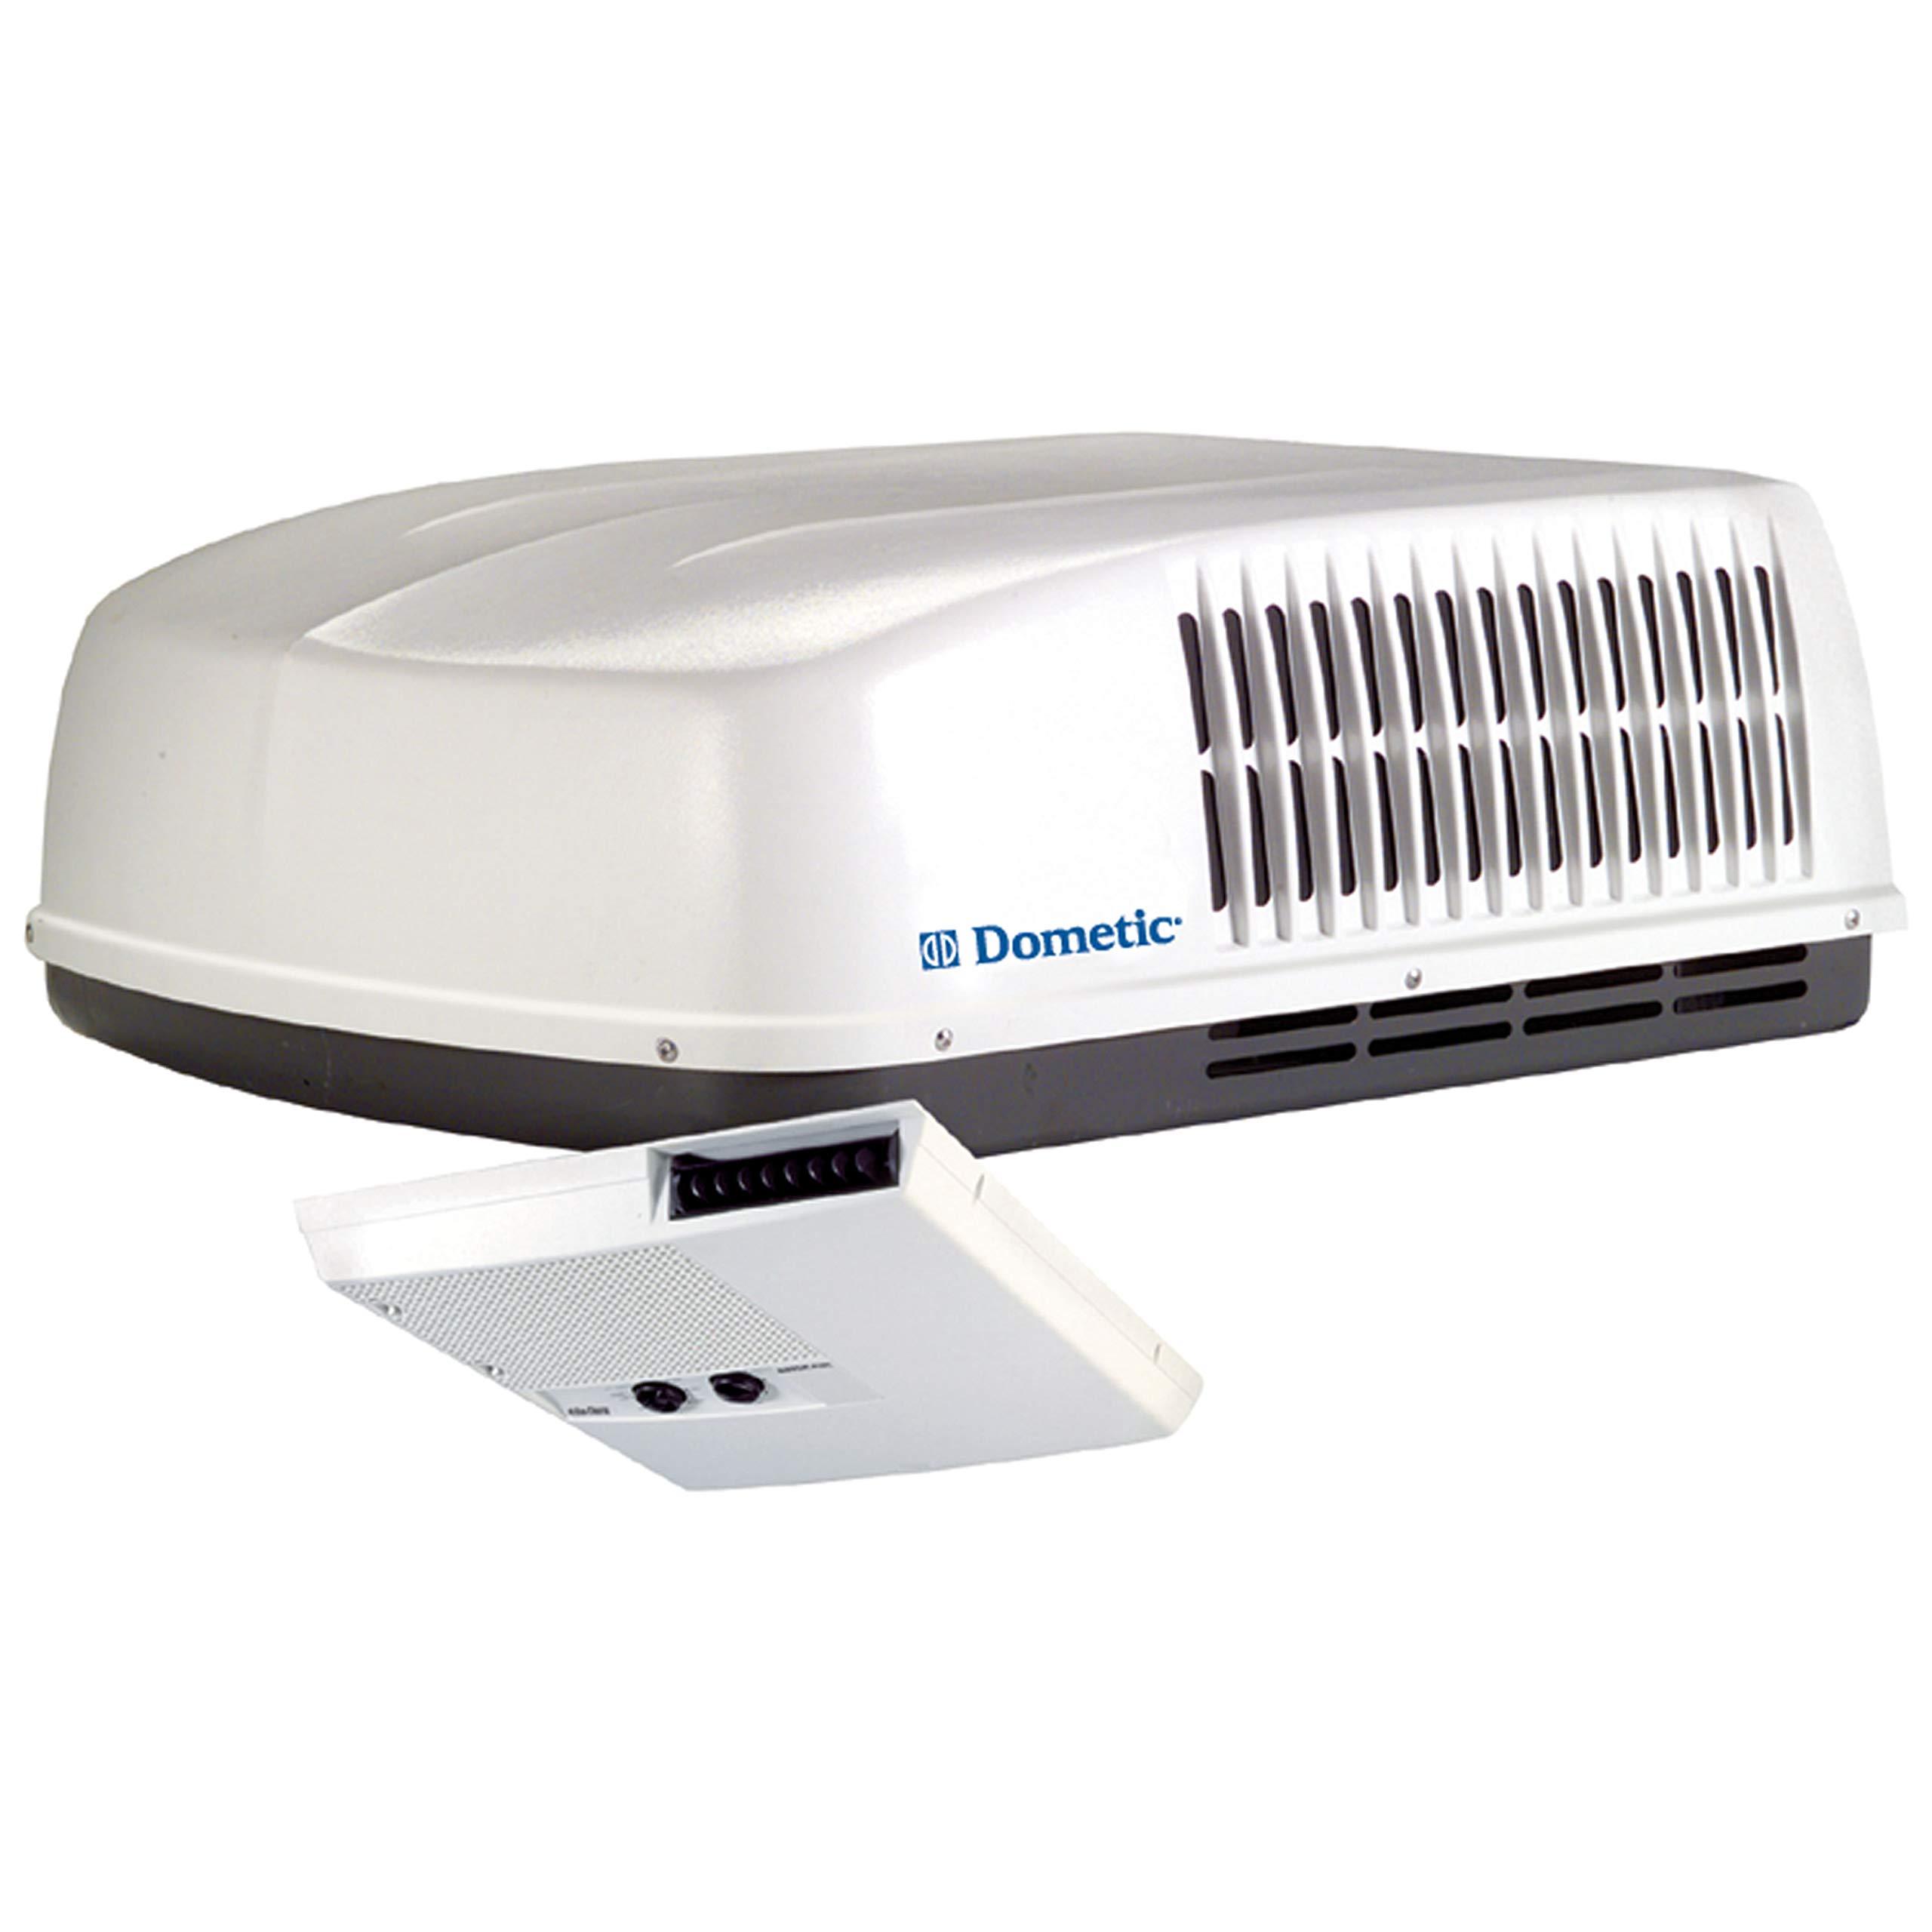 Dometic Air Conditioners 479516AXX1C0 Brisk Air 15.0 Cg Pw Upper Unit